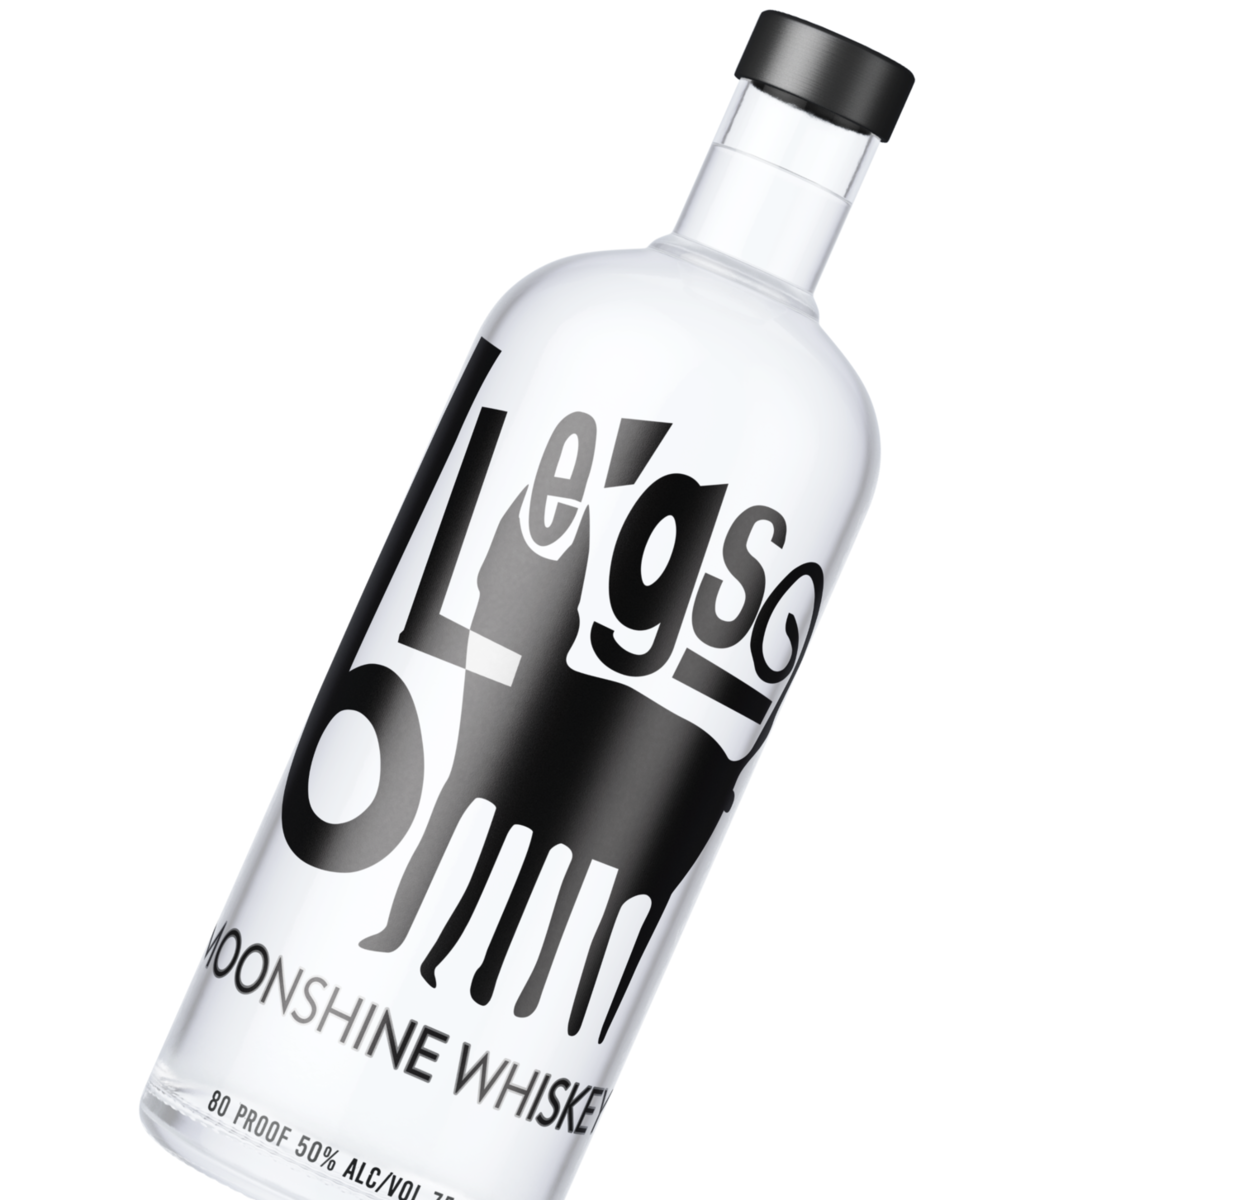 6Legs Moonshine Whiskey